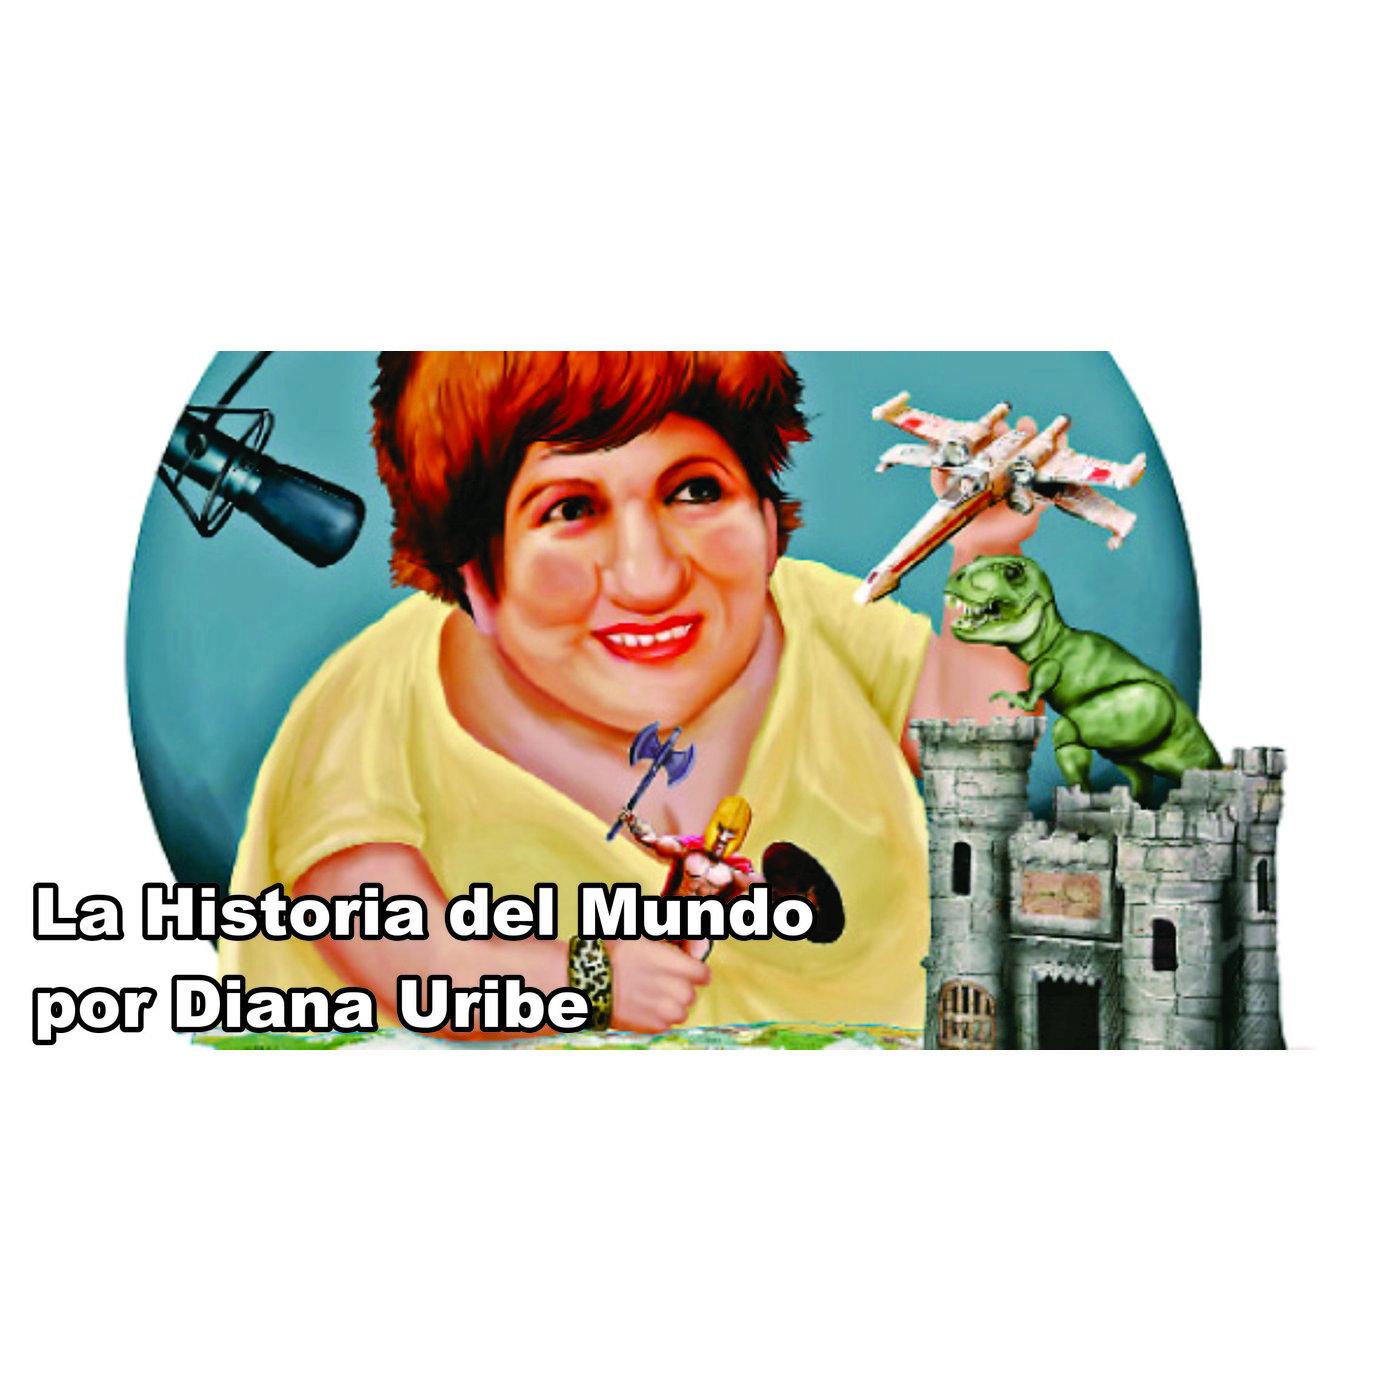 <![CDATA[La Historia del Mundo por Diana Uribe]]>